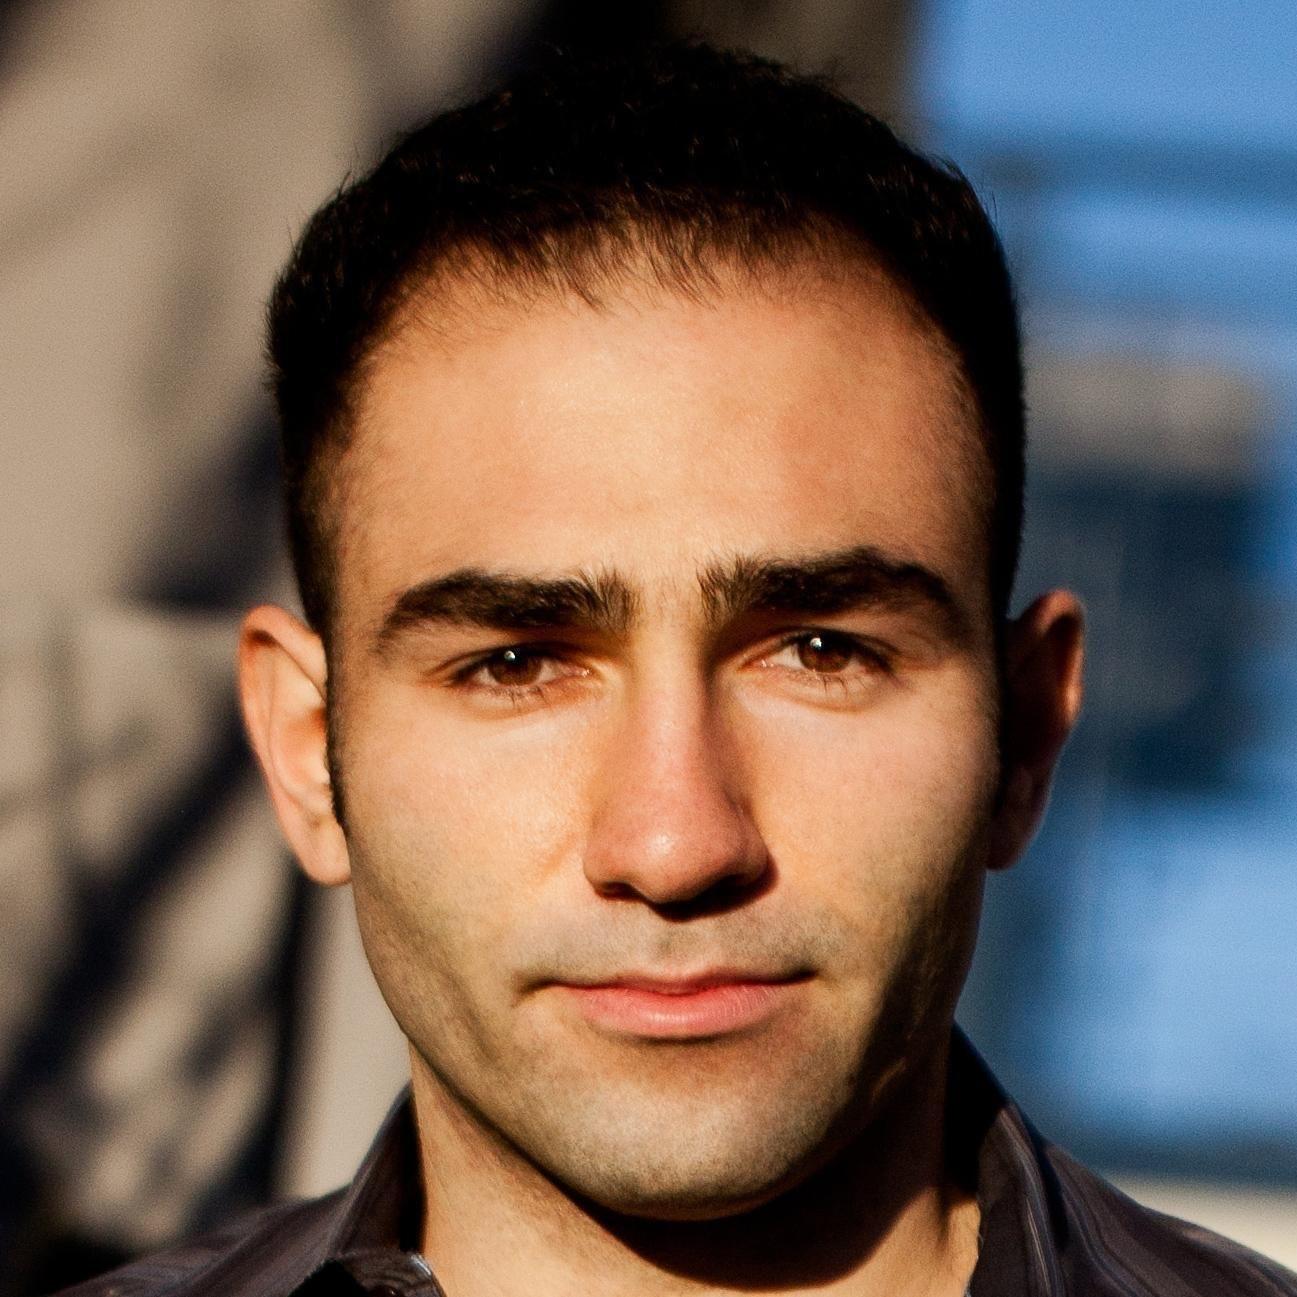 Aryk Grosz